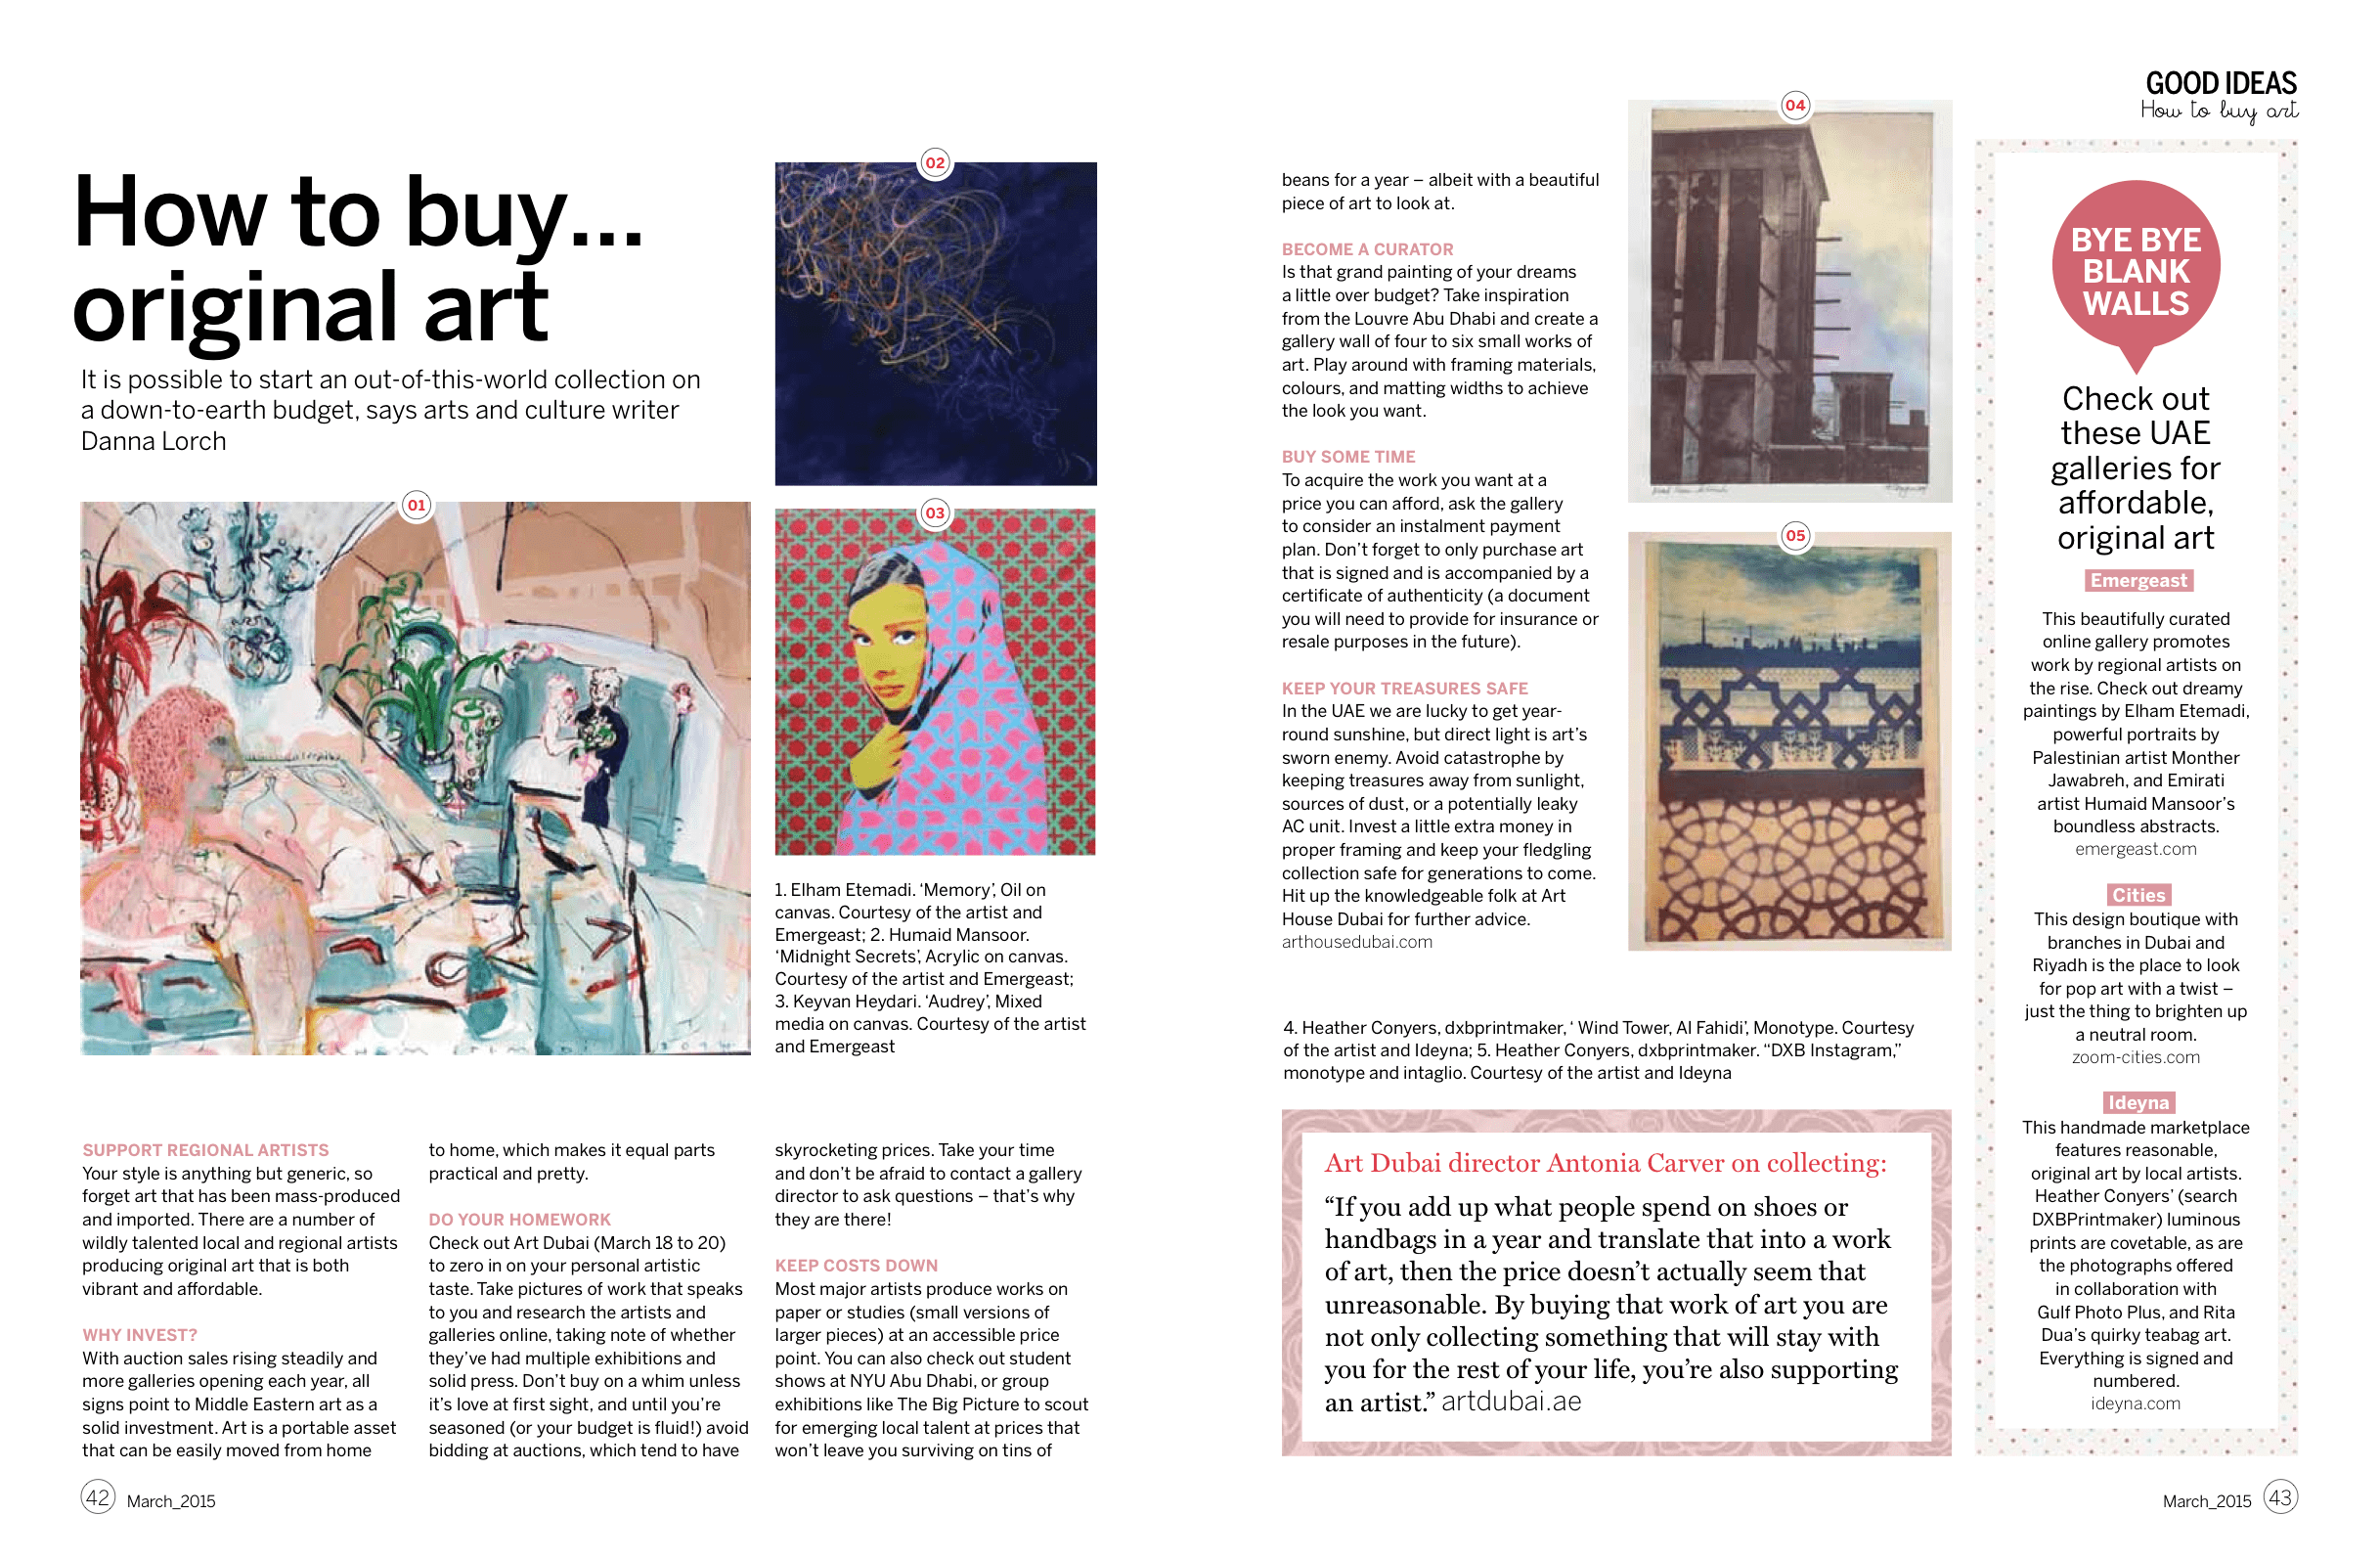 how to buy original art emergeast